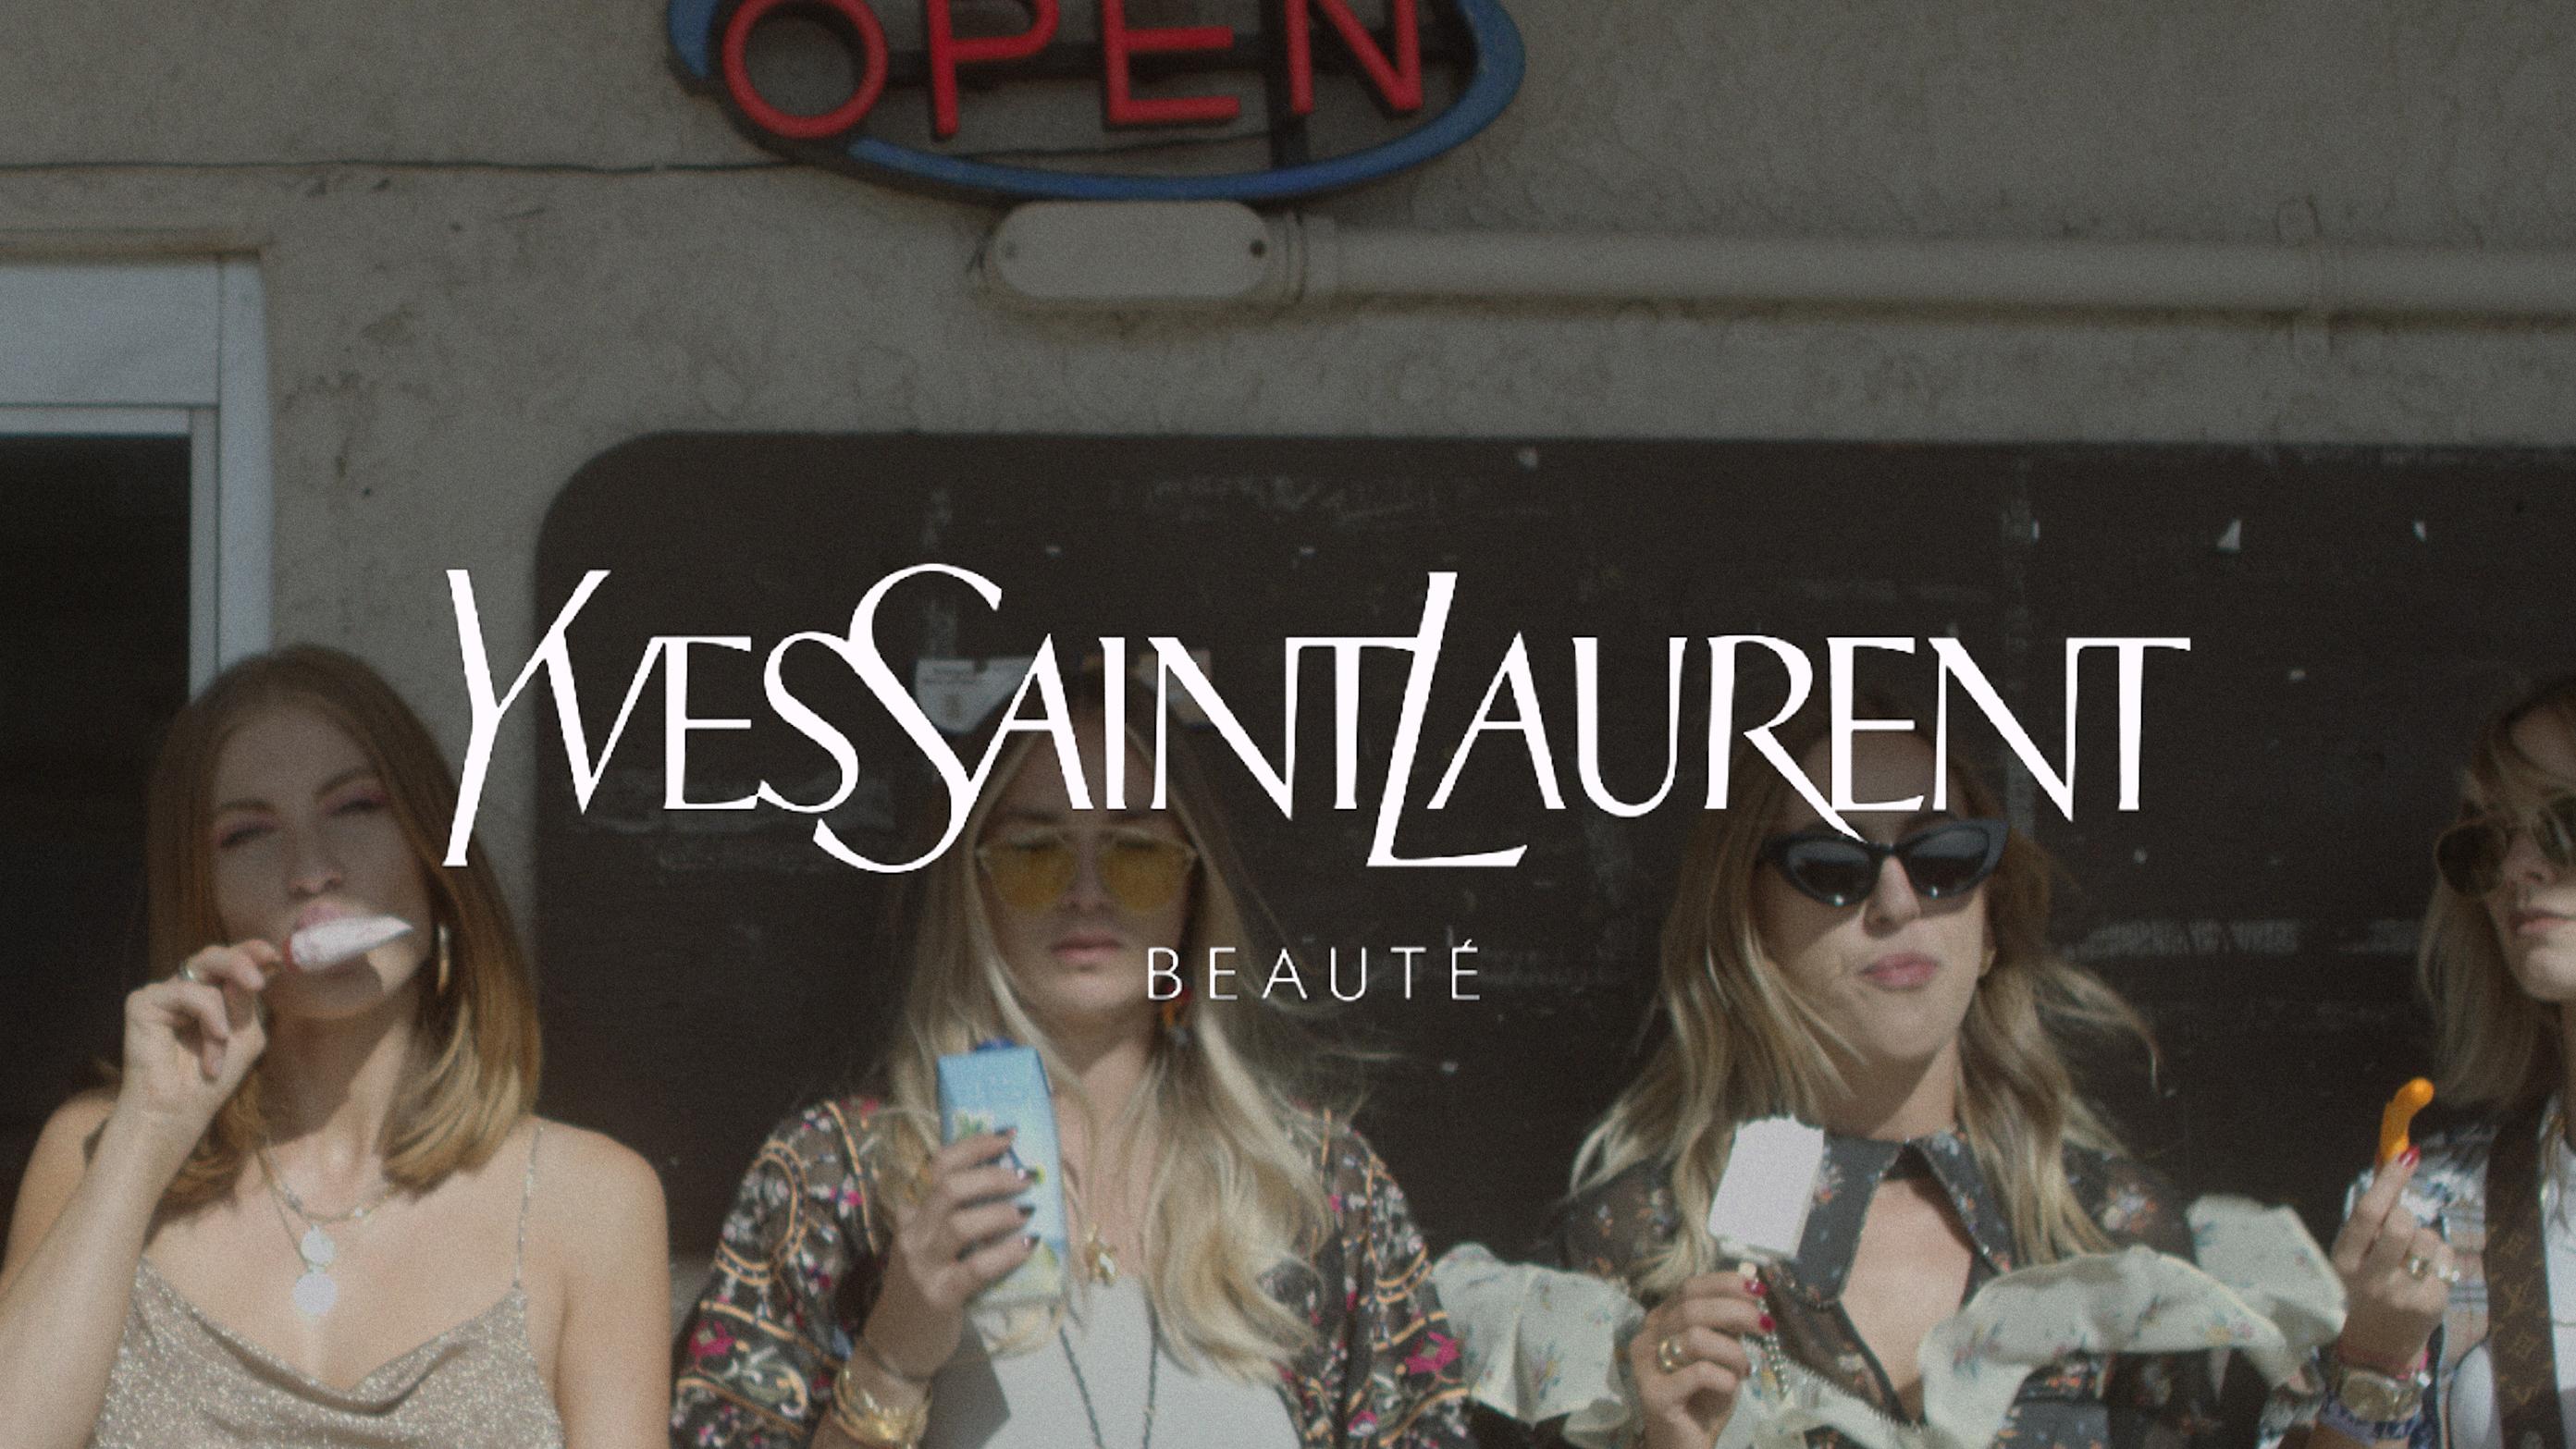 Yves Saint Laurent (Beyond The Festival)